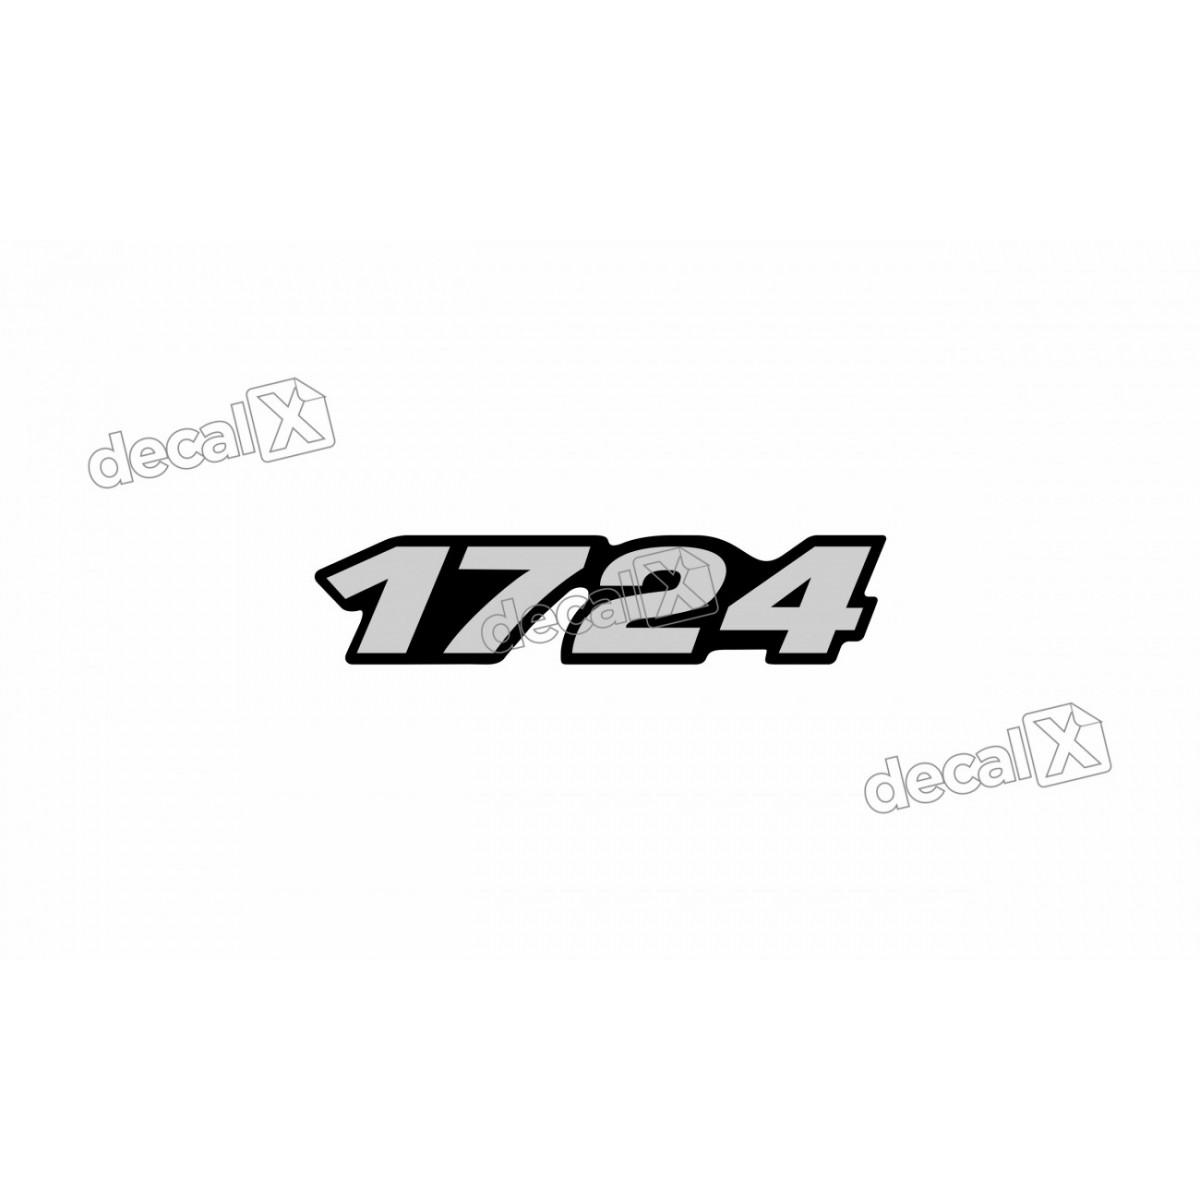 Adesivo Emblema Resinado Mercedes 1724 Cm63 Decalx